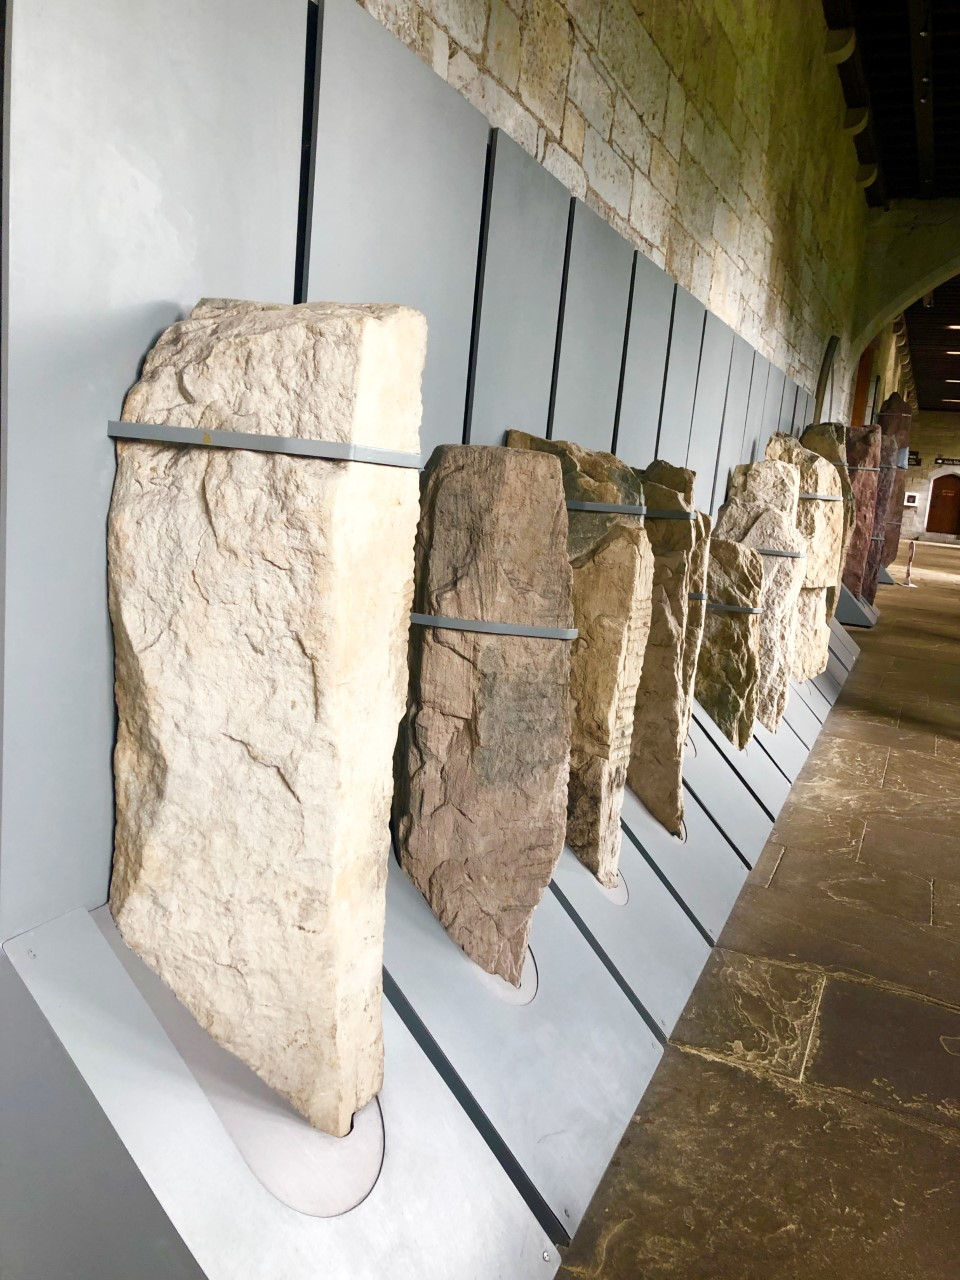 History of Ogham Stones in Ireland